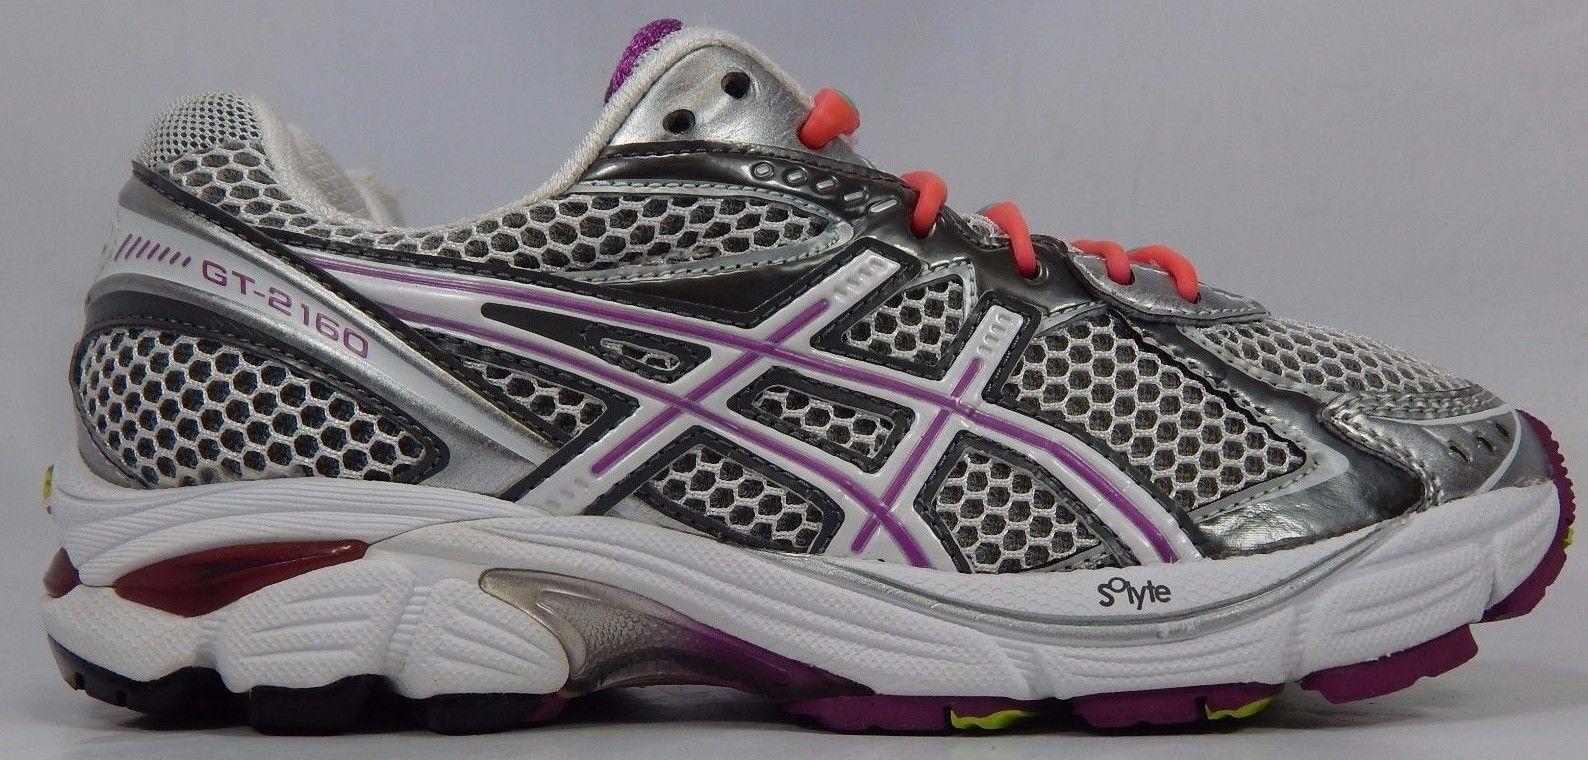 Asics GT 2160 Women's Running Shoes Size US 7.5 M (B) EU 39 White Gray T154N